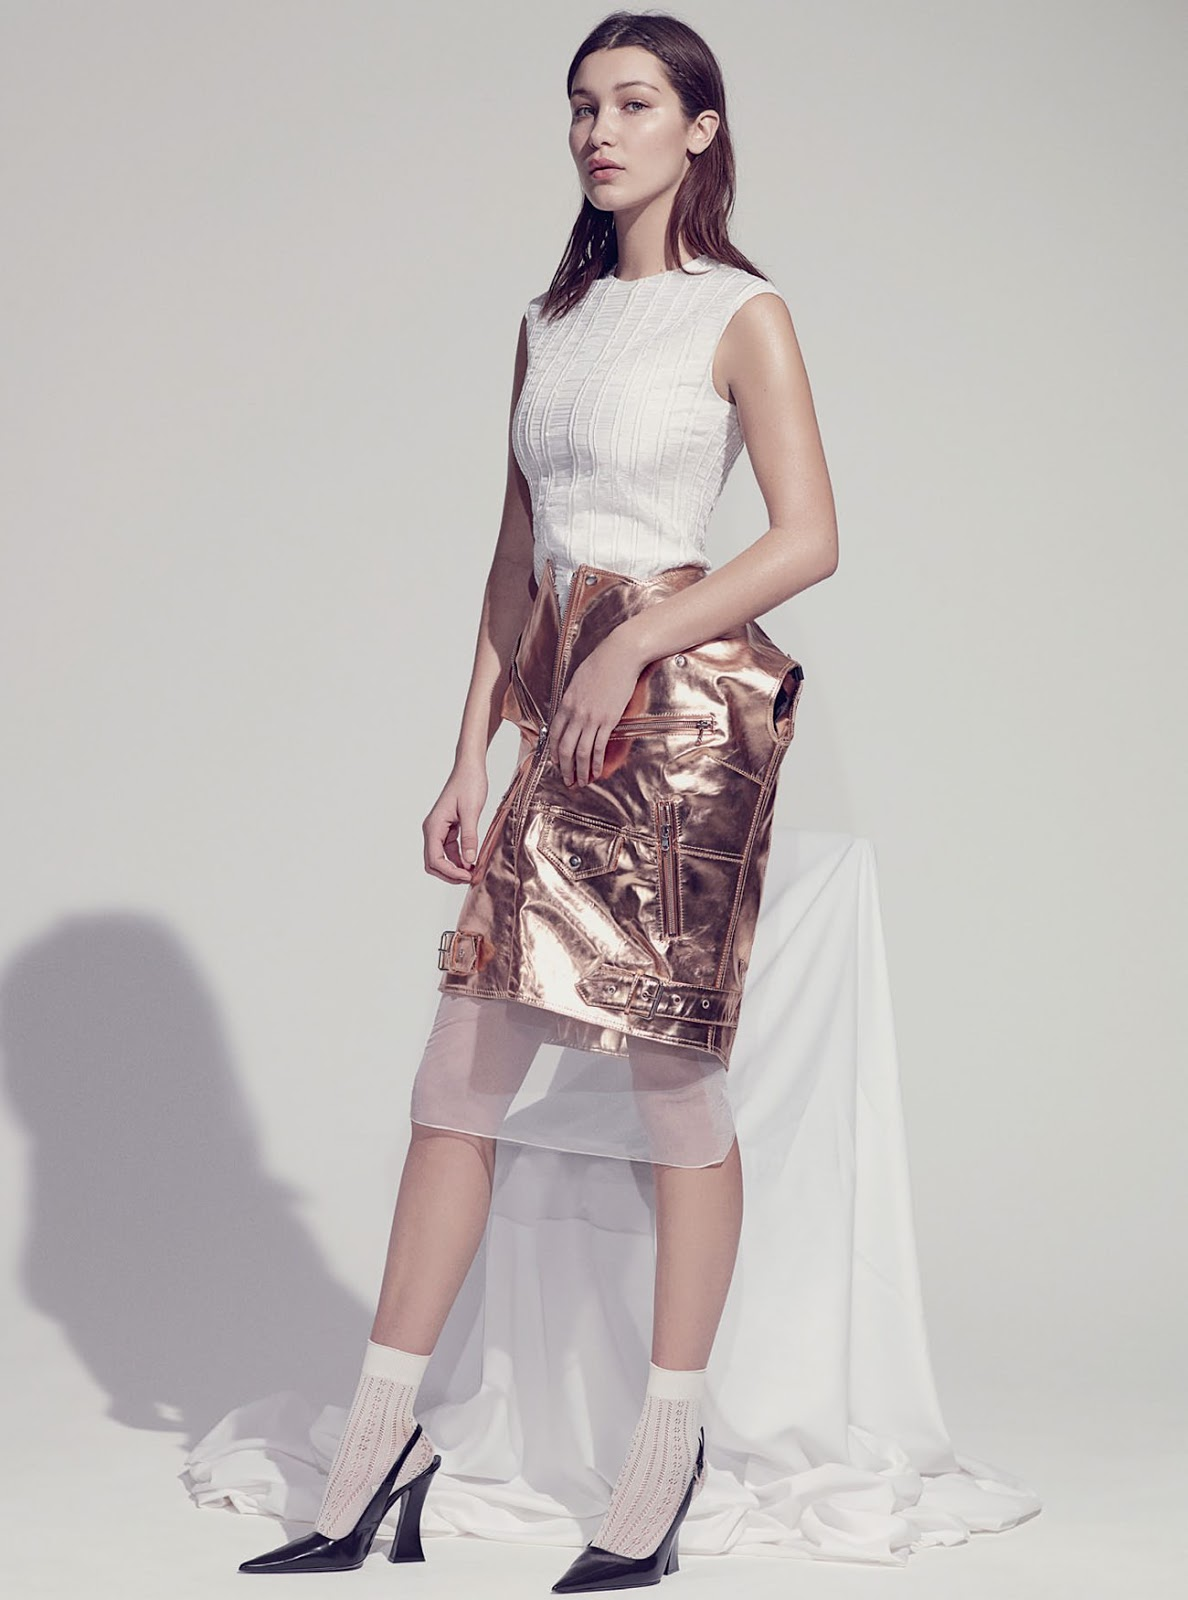 Editorial Fashion | Editorials from Around Fashion October